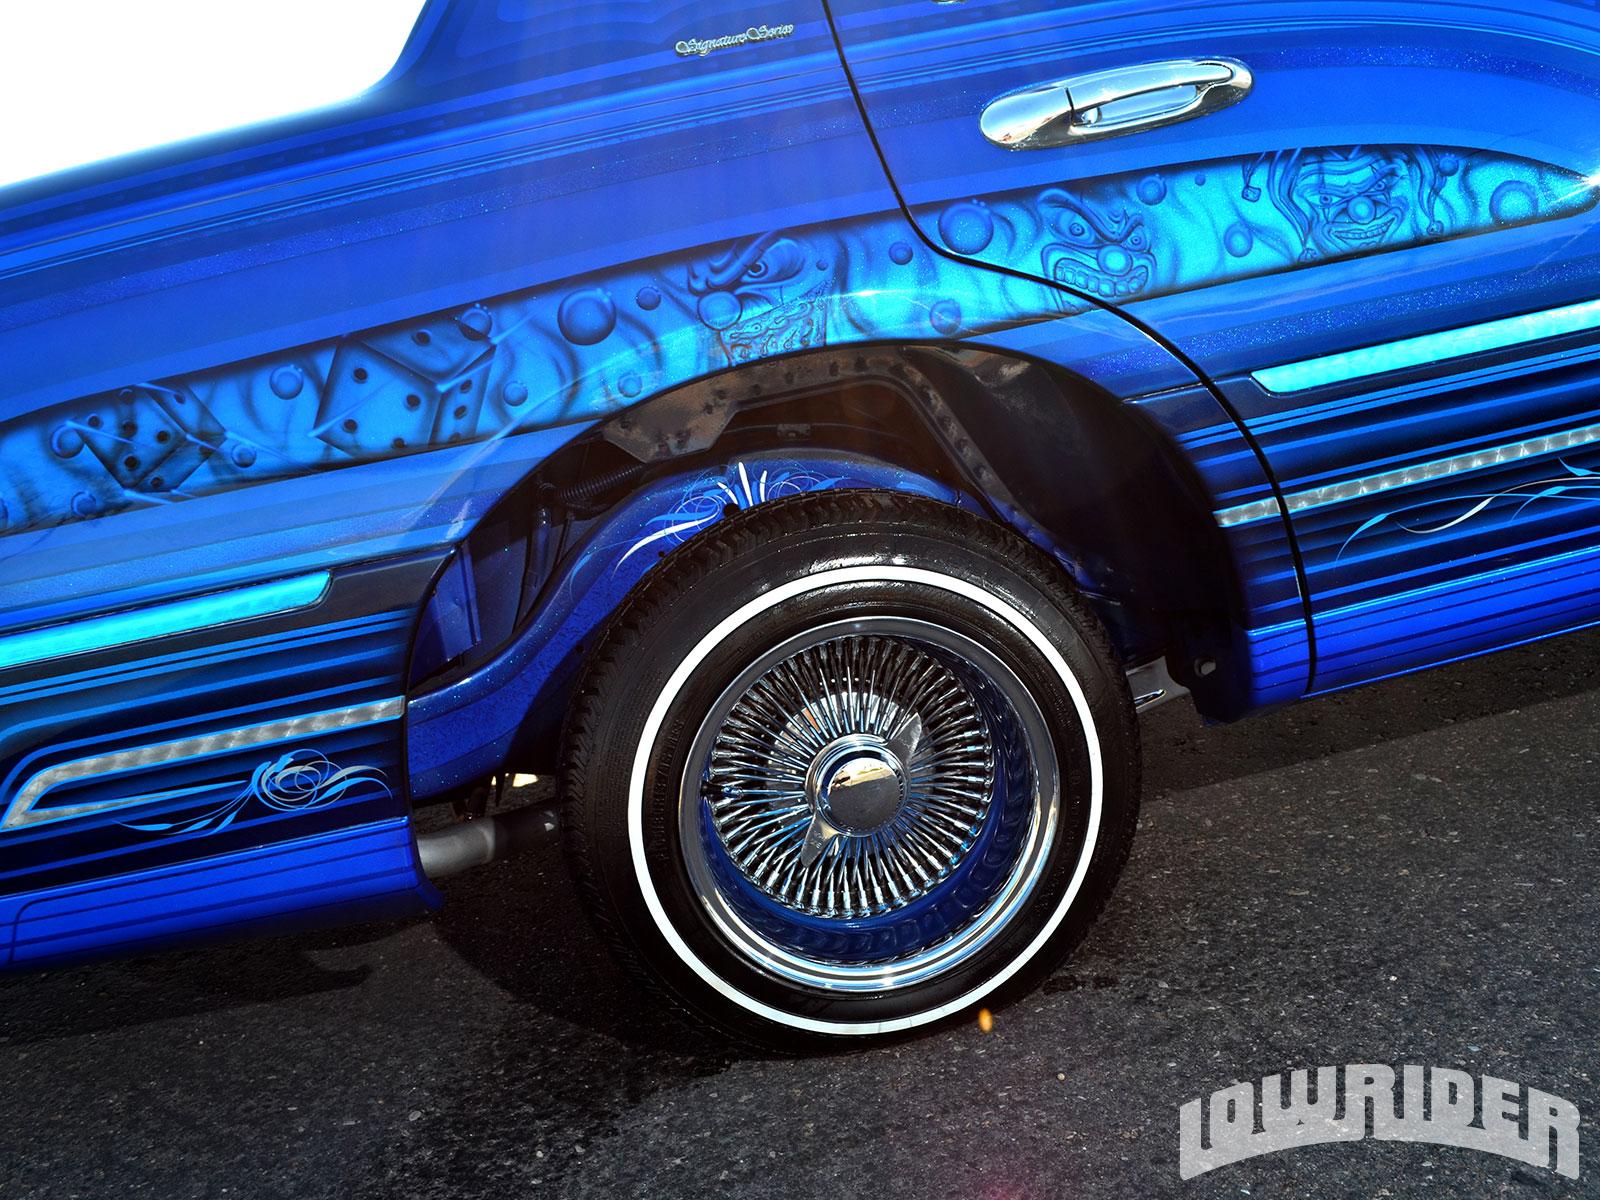 1998 Lincoln Town Car Lowrider Magazine